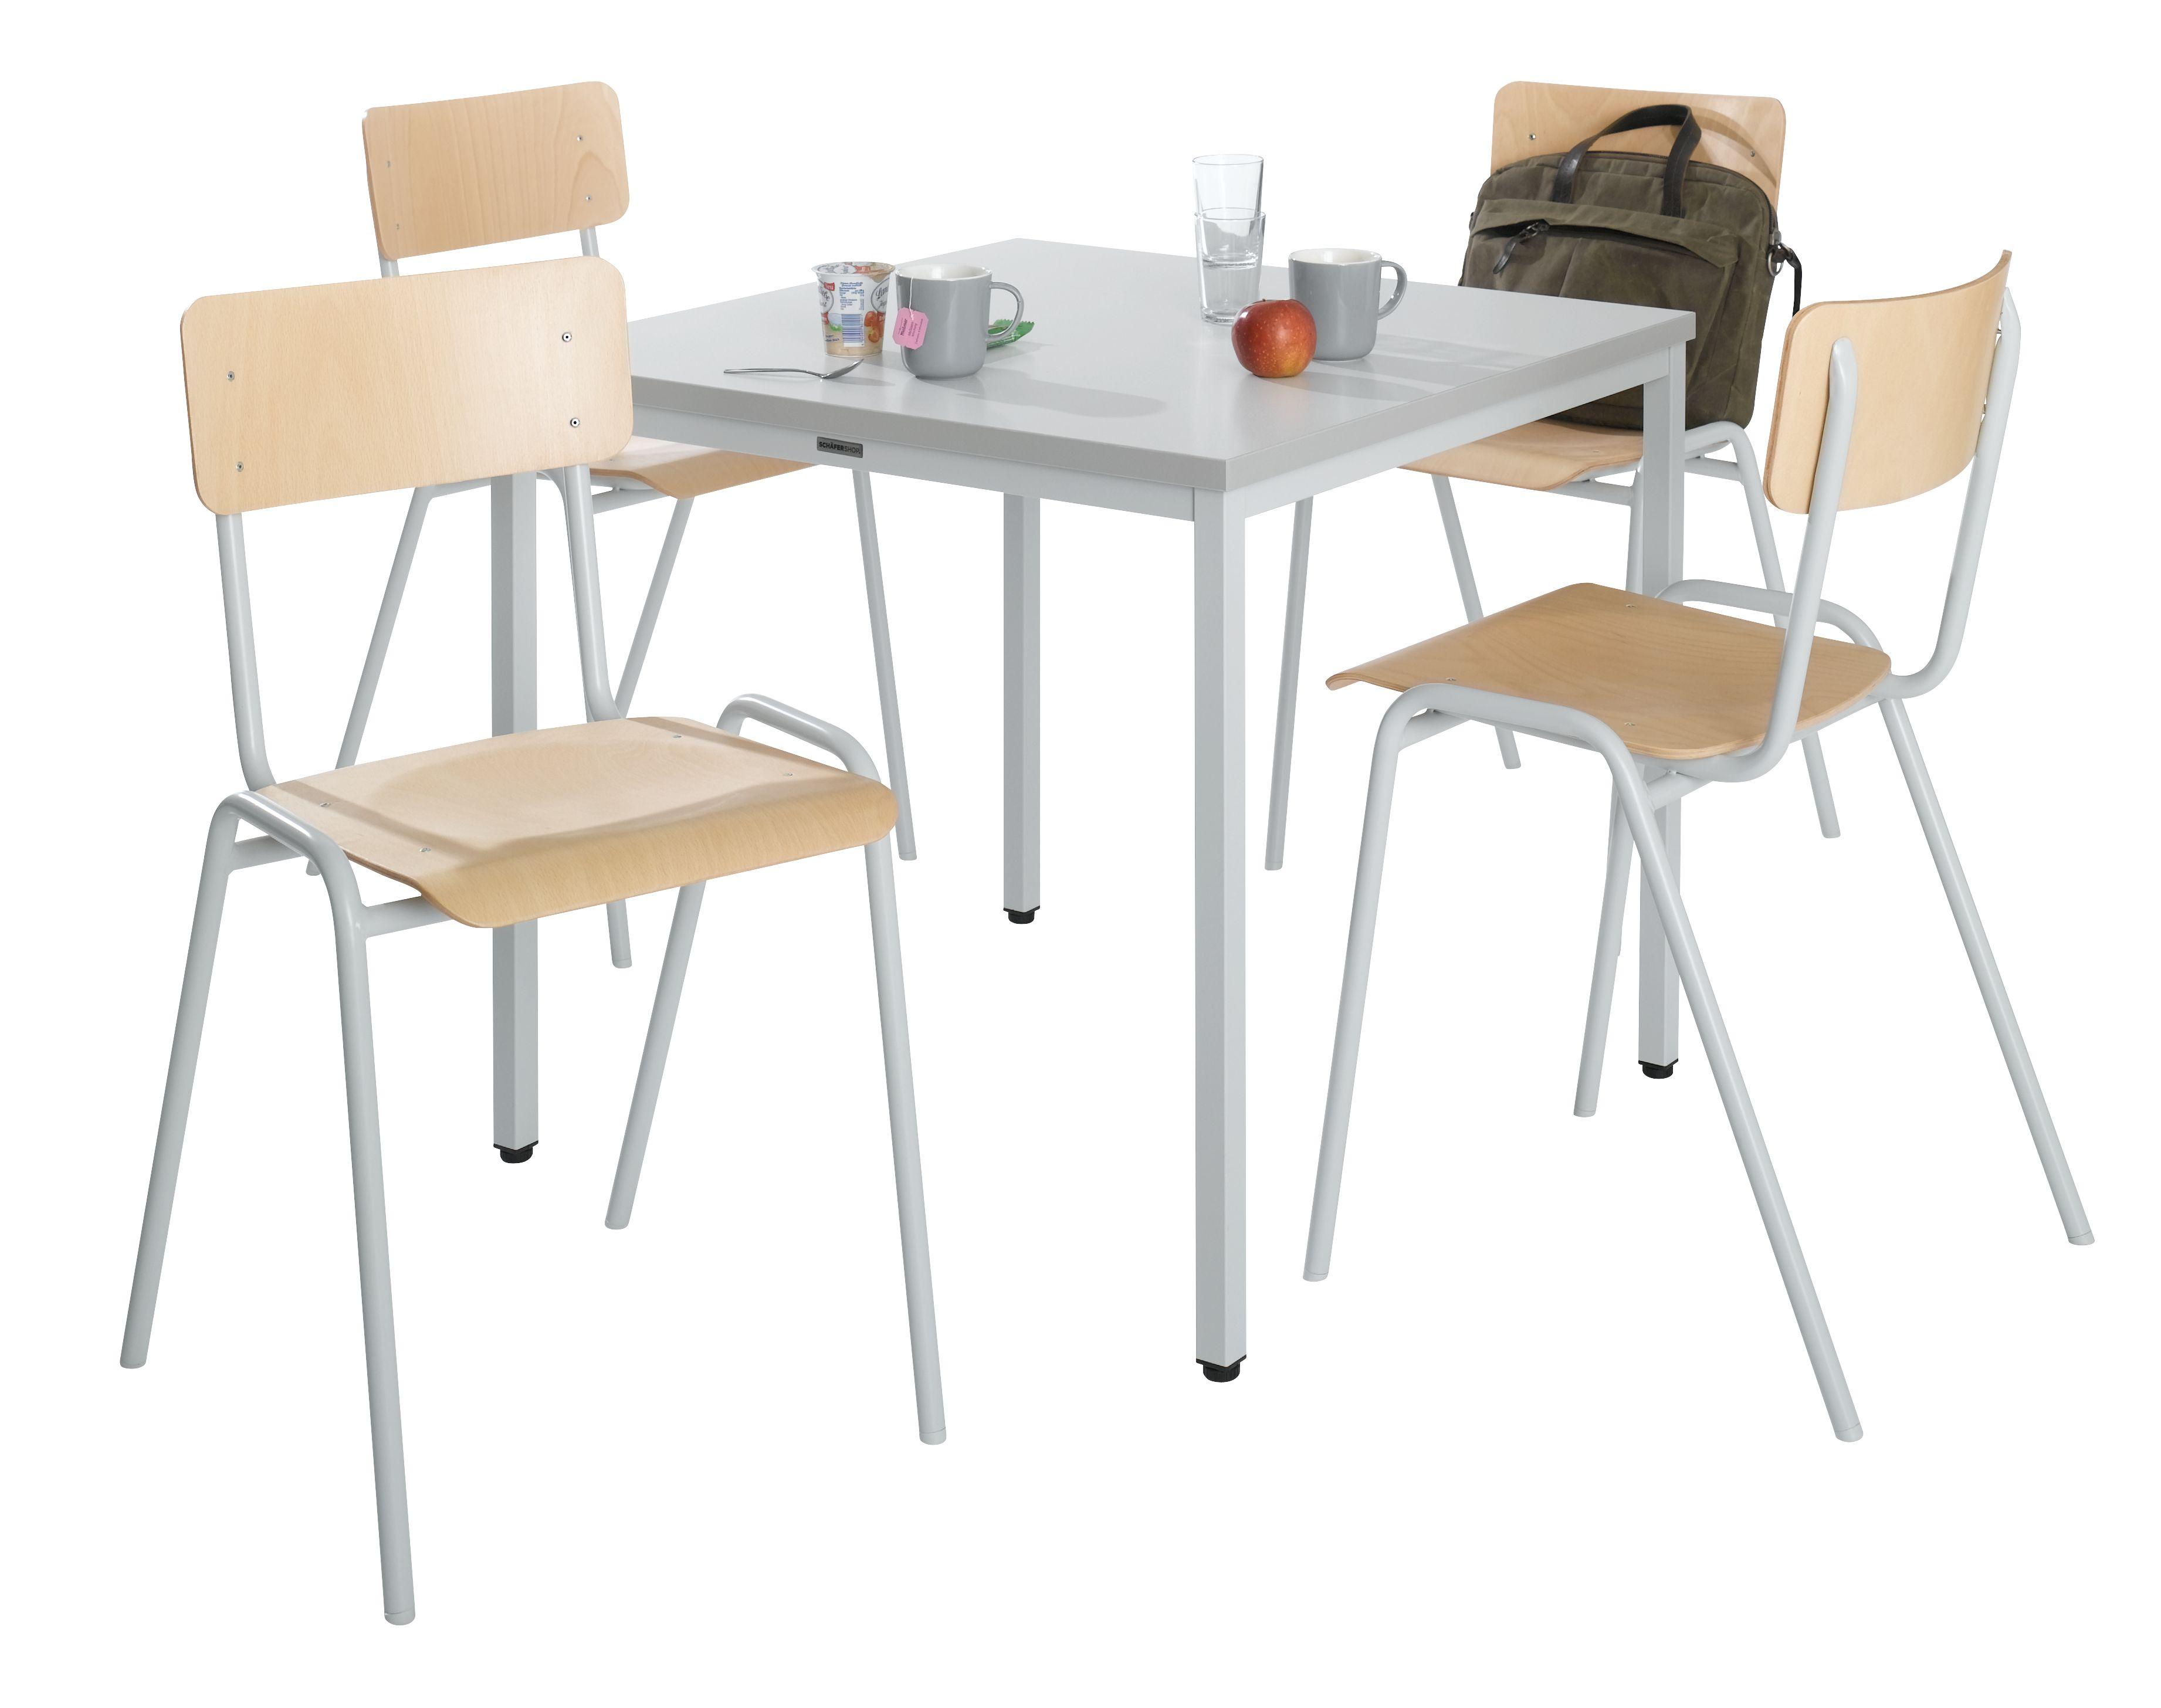 stahlrohr tisch 4 stapelst hle set g nstig kaufen. Black Bedroom Furniture Sets. Home Design Ideas